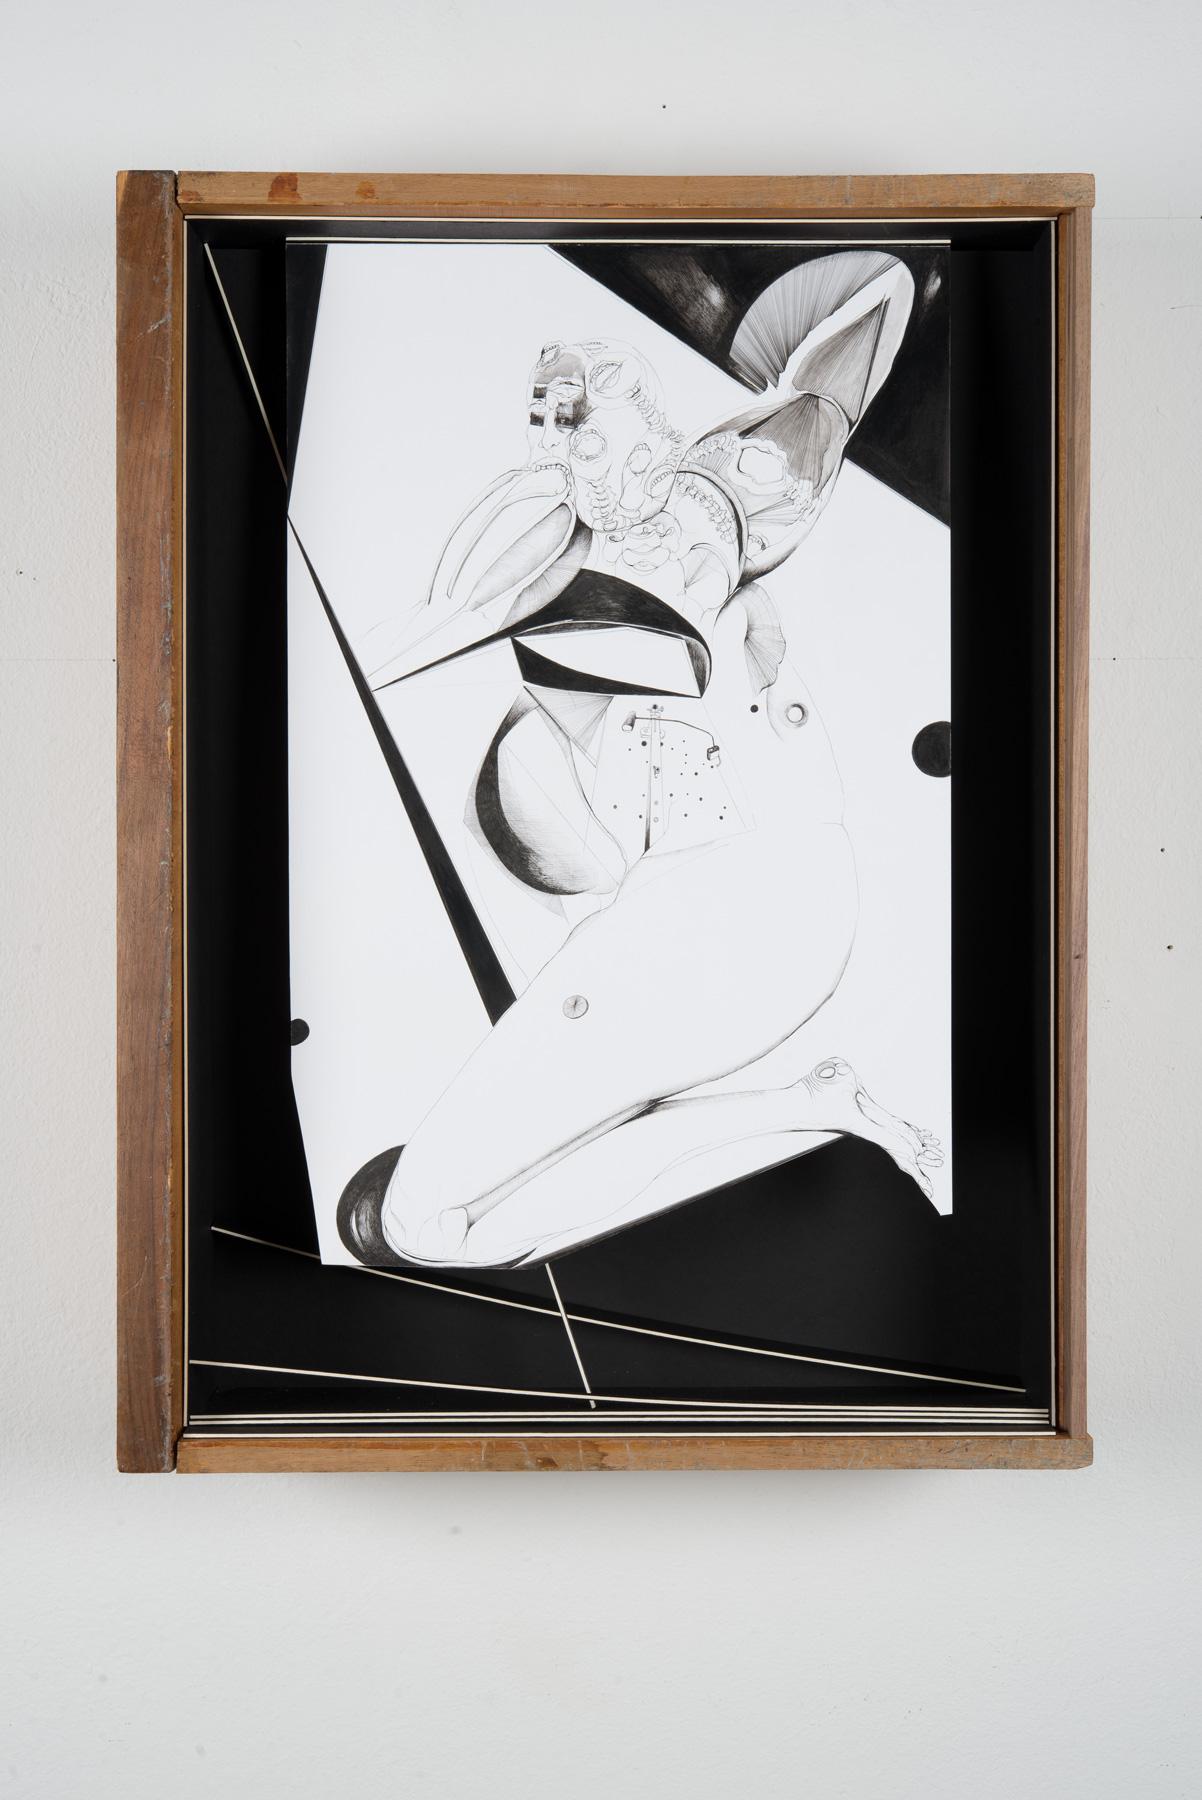 Nina Annabelle Märkl | Black box | Ink on paper, cut outs, black paper, wooden box | 55 x 43,5 x 15 cm | 2014